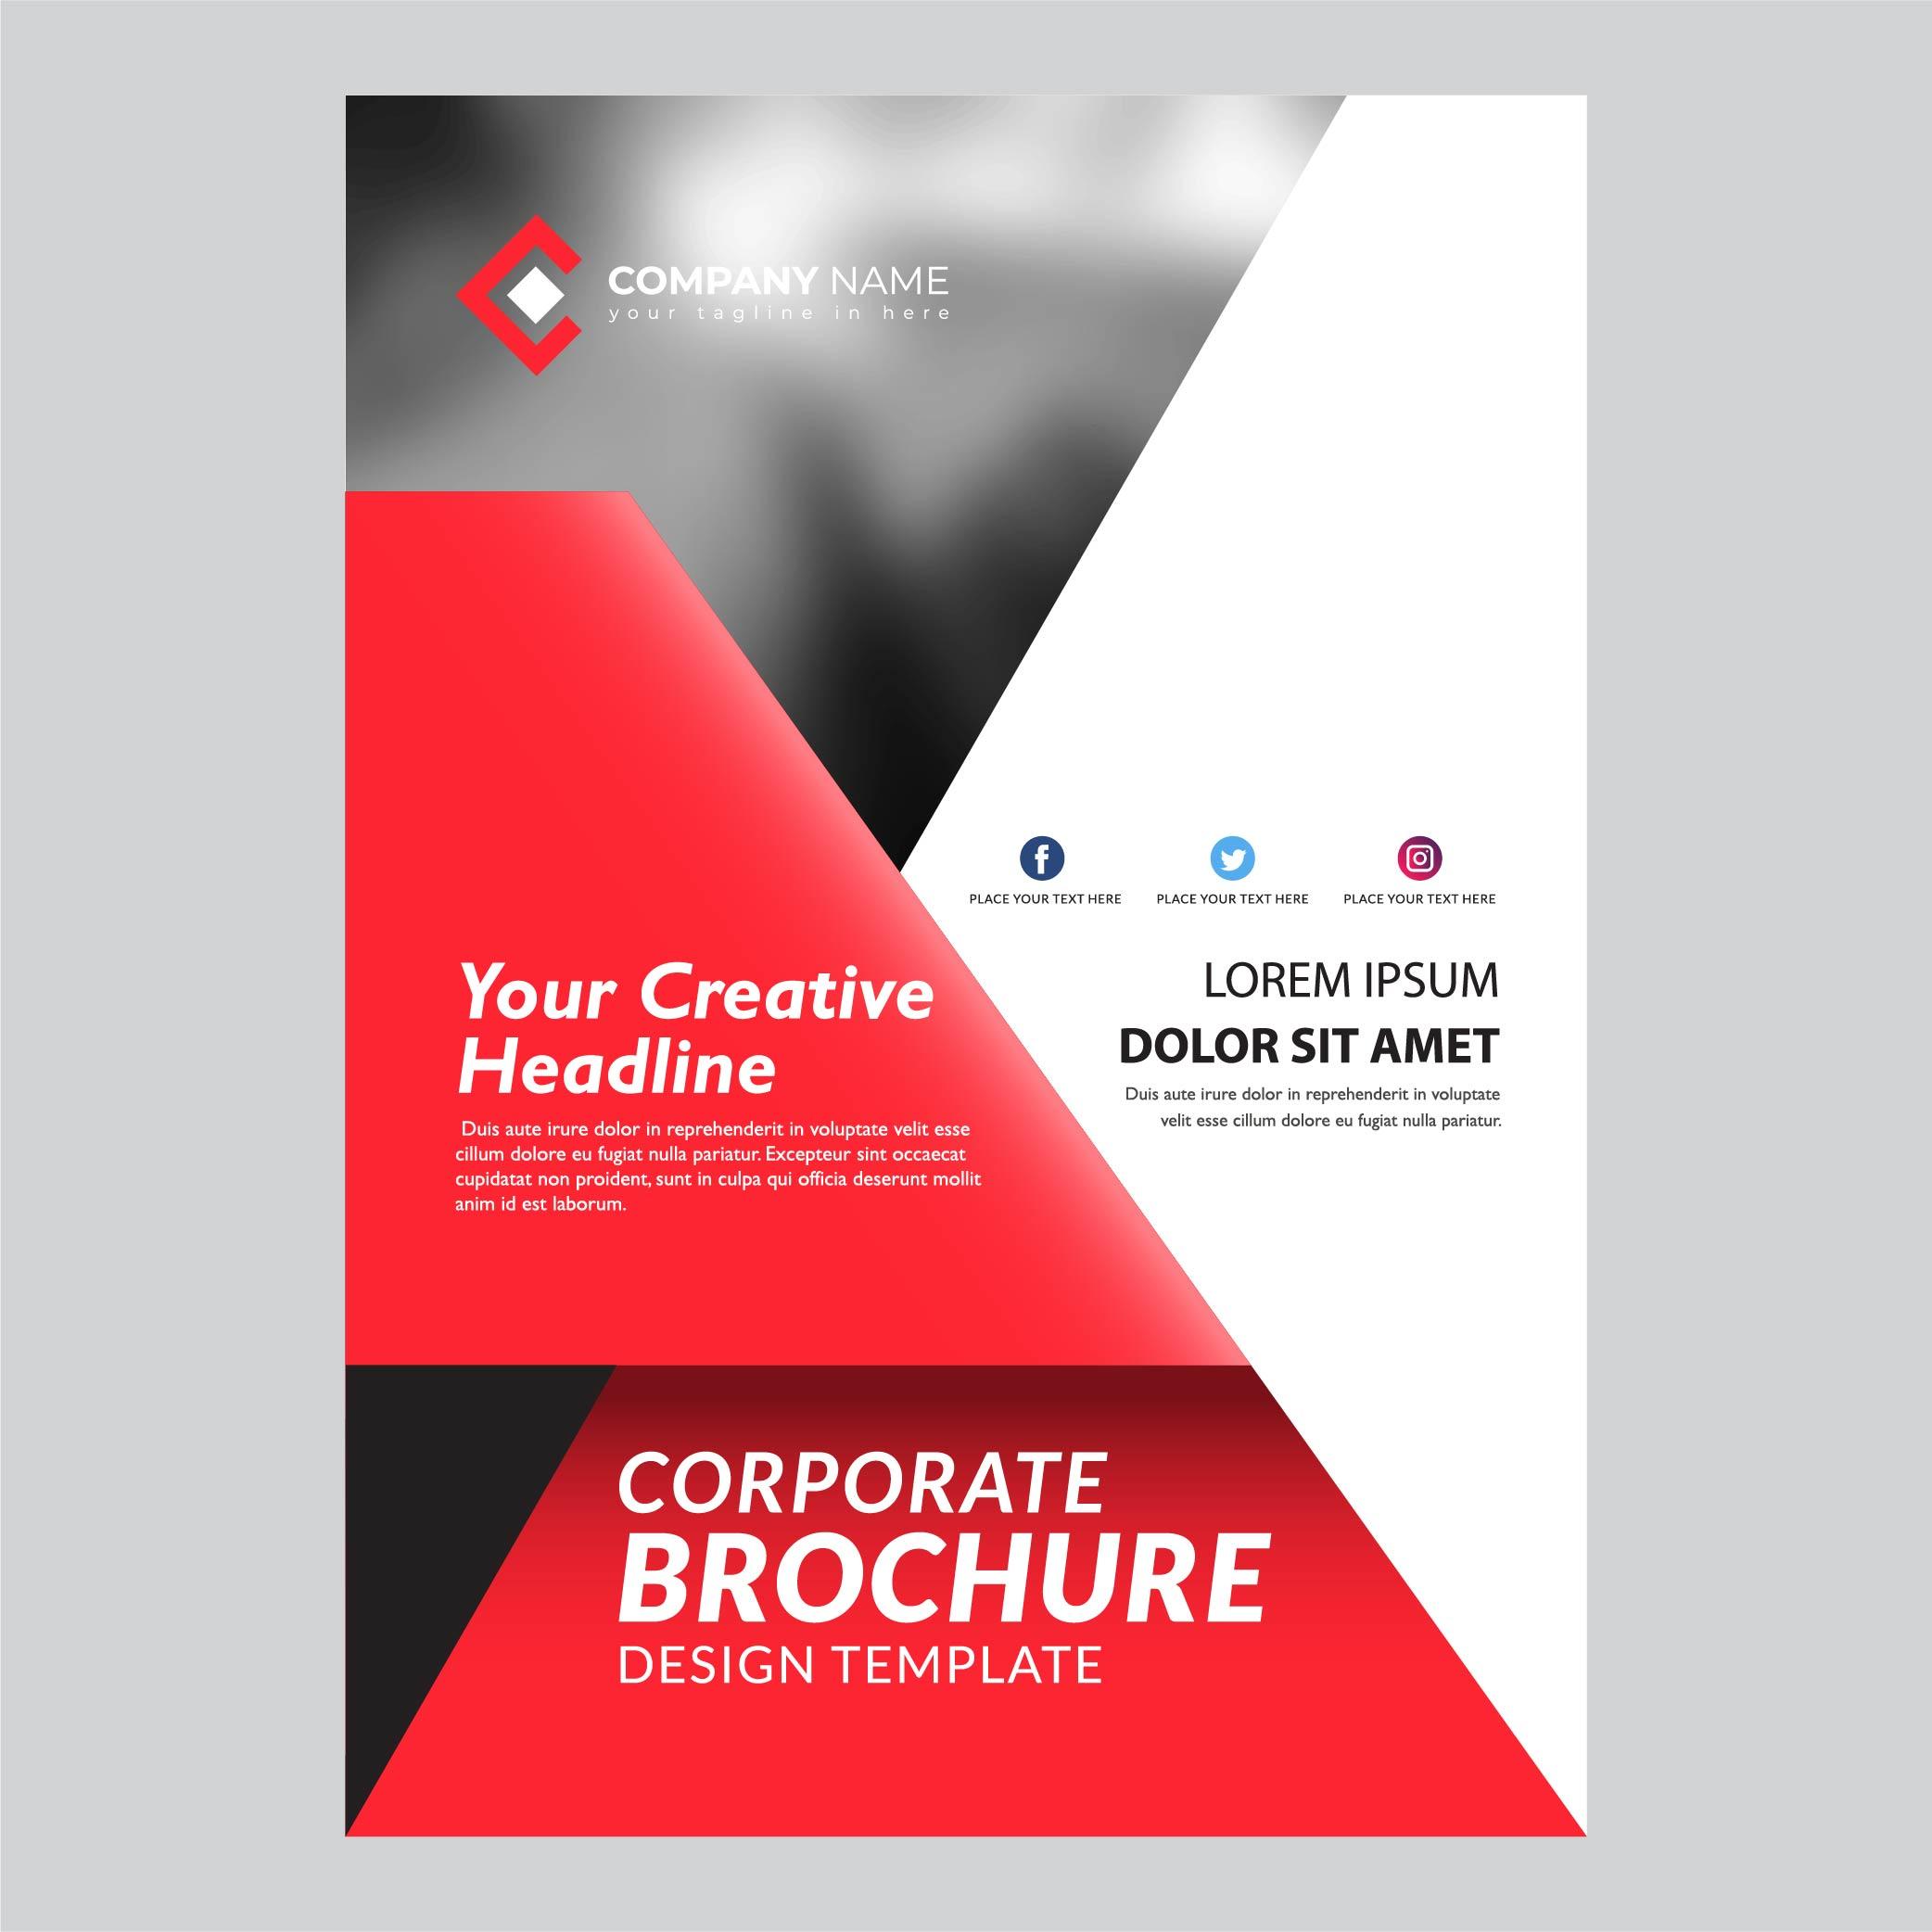 Red Modern Flyer Template Design   Download Free Vectors ...